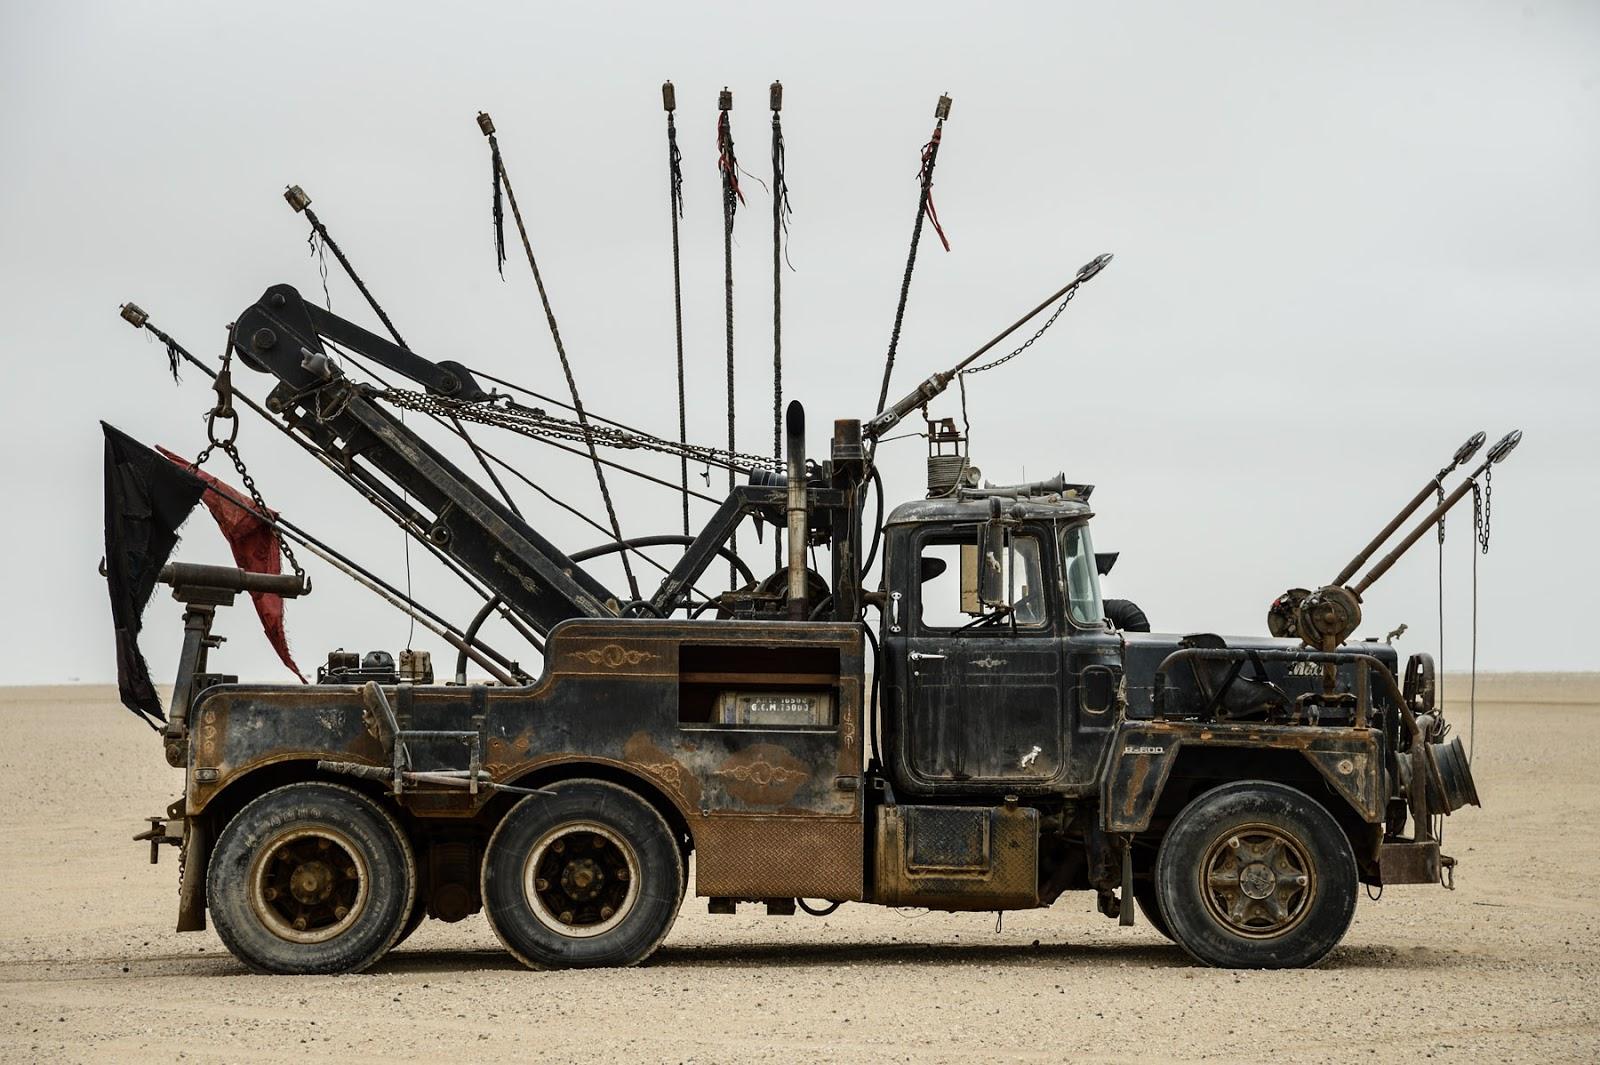 Mercedes Cars Used In Movie War Machine